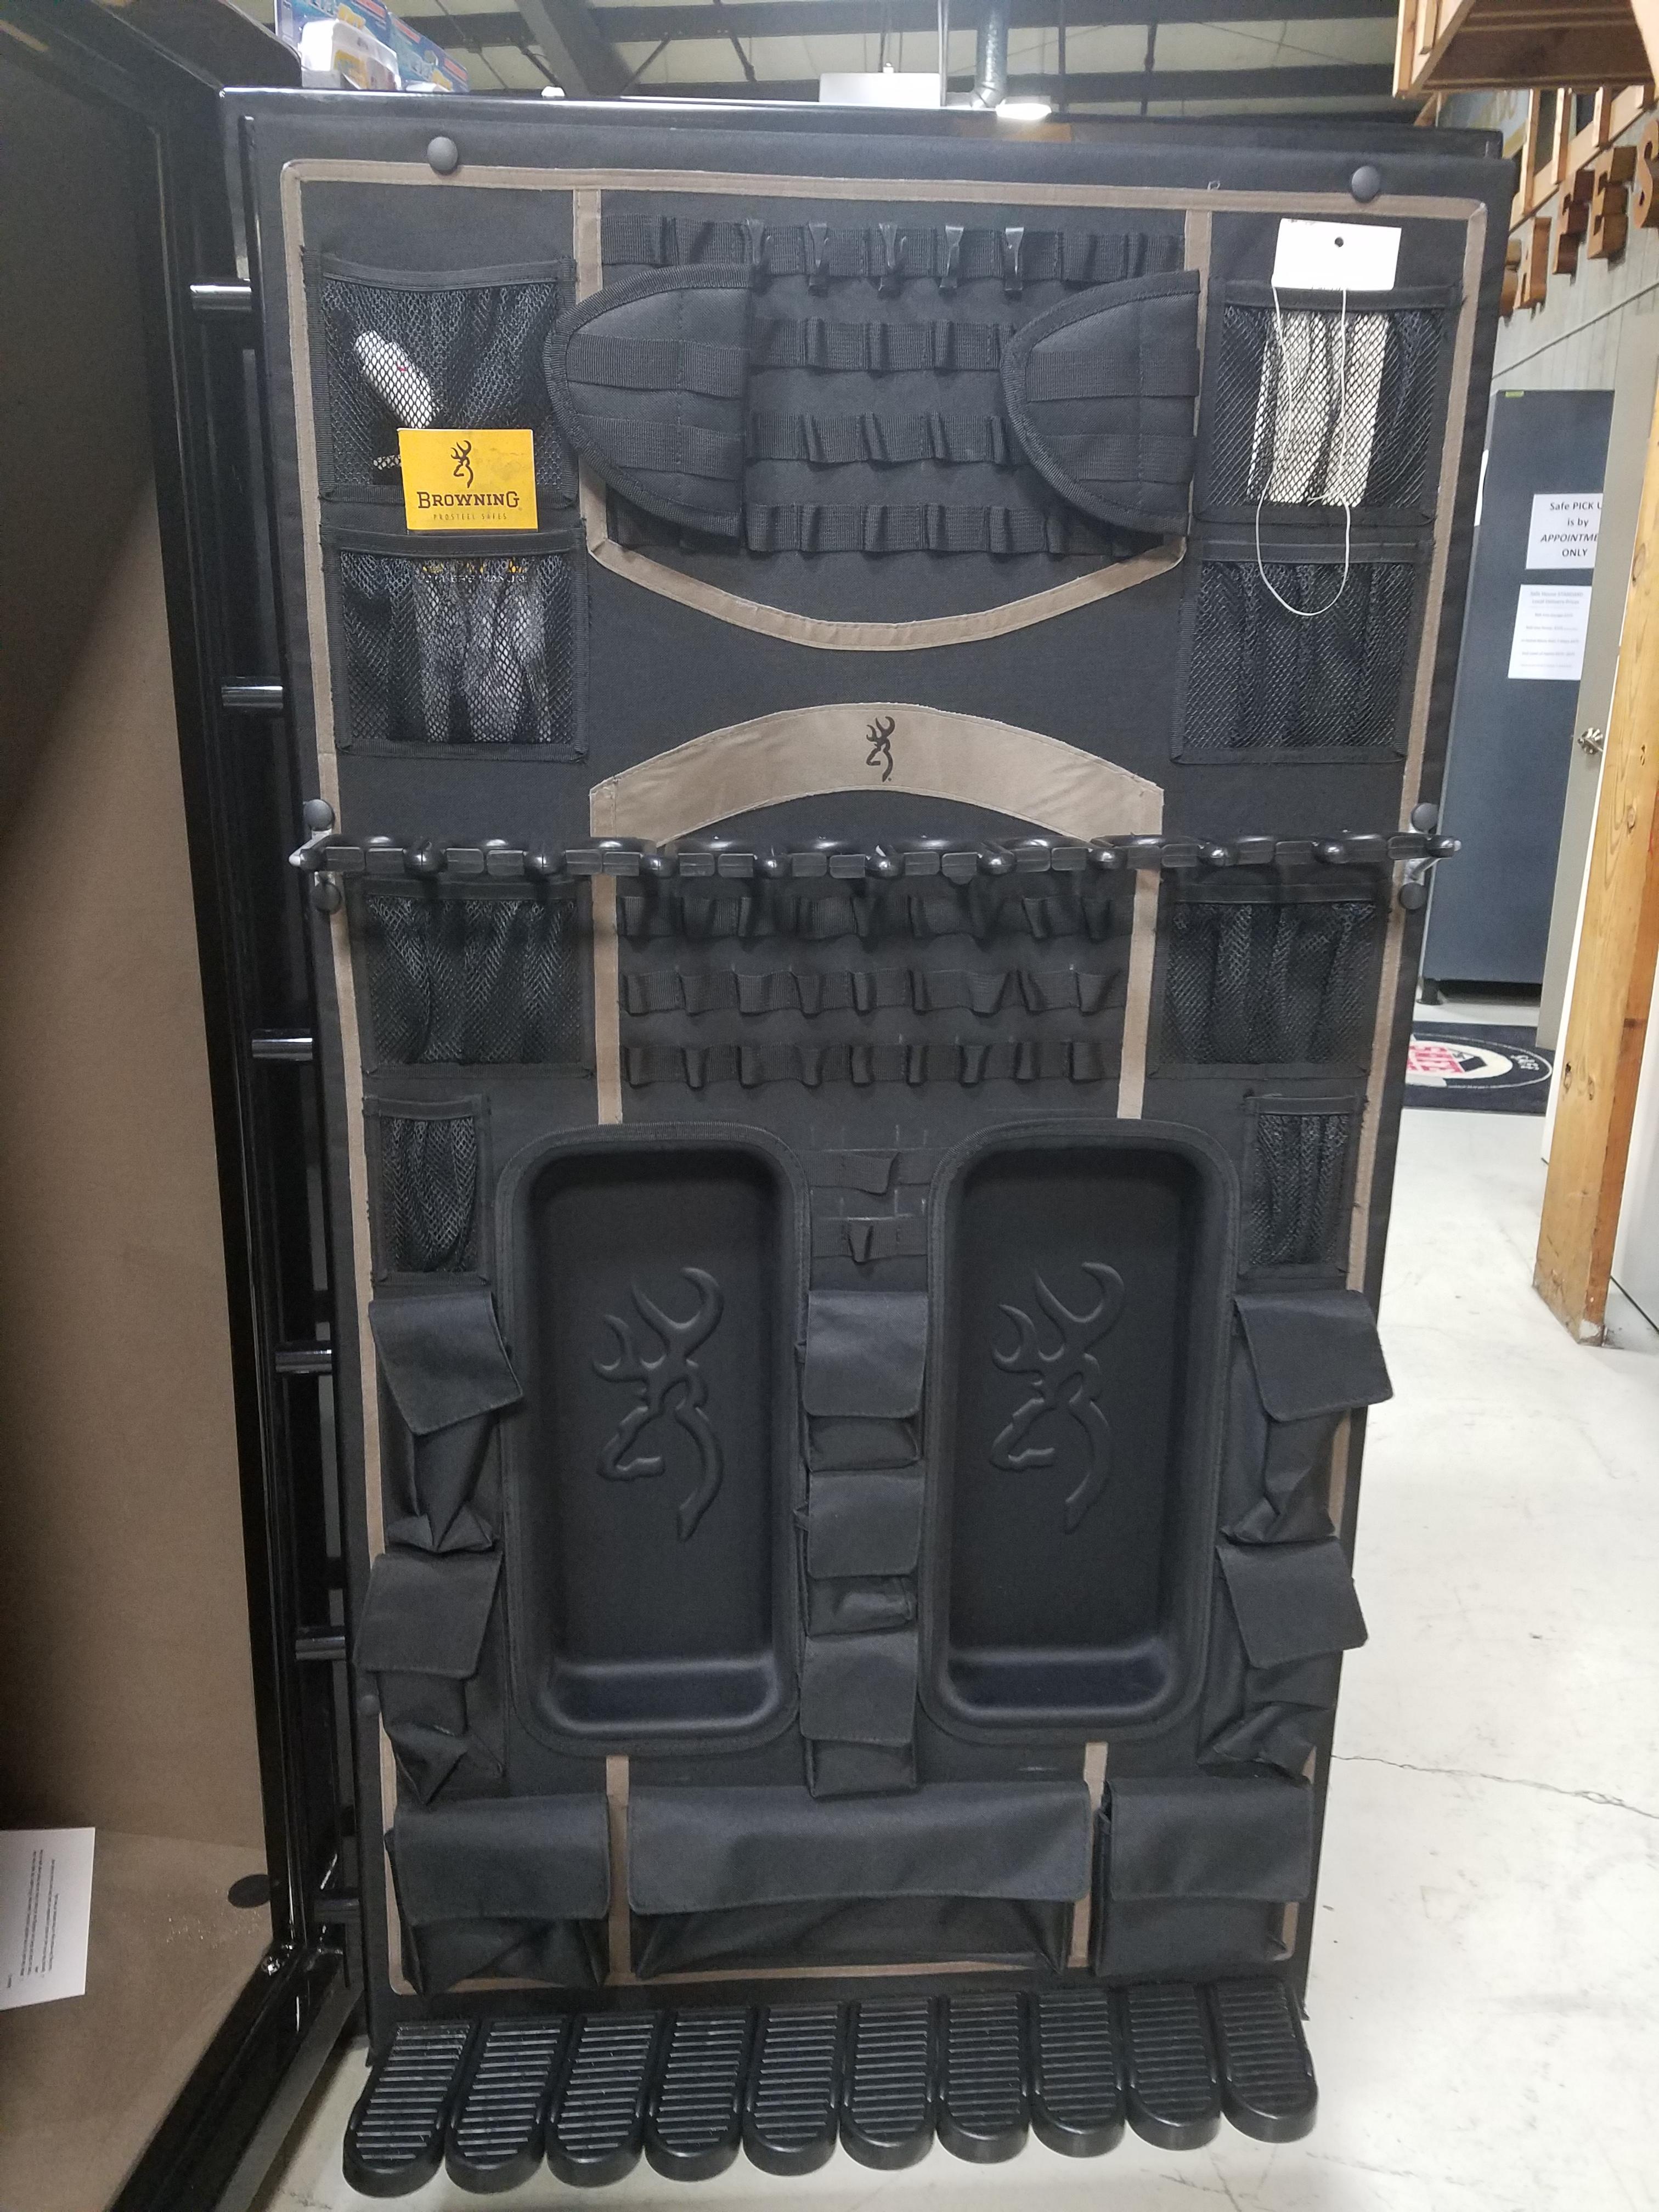 Browning Select ST49 Gun Safe DISCOUNTED